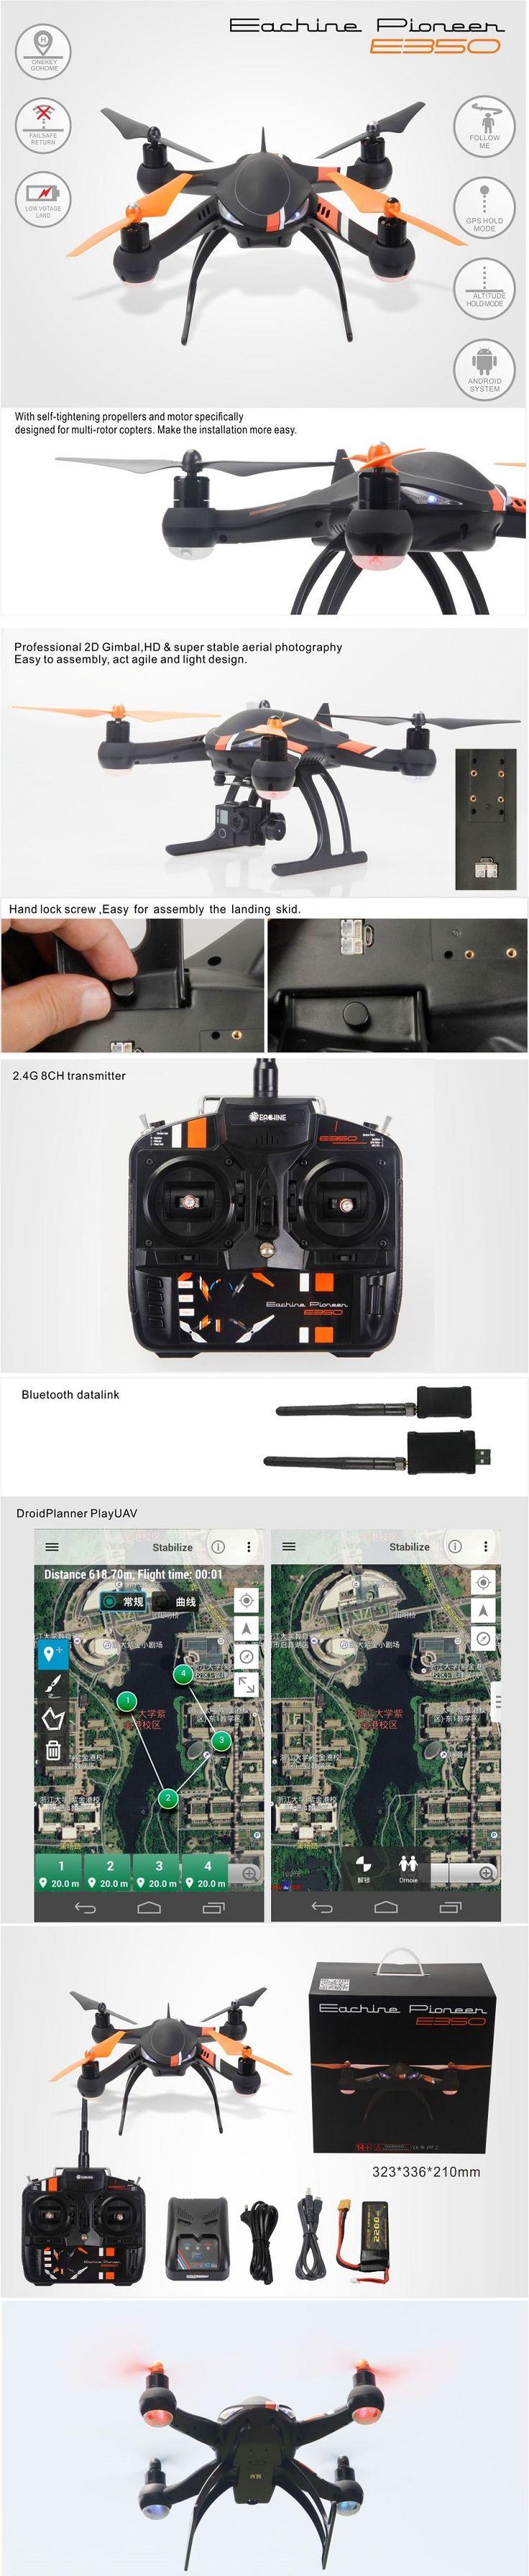 Eachine Pioneer E350 With GPS 915MHz Radio Telemetry Kit 2.4G 8CH RC Quadcopter RTF